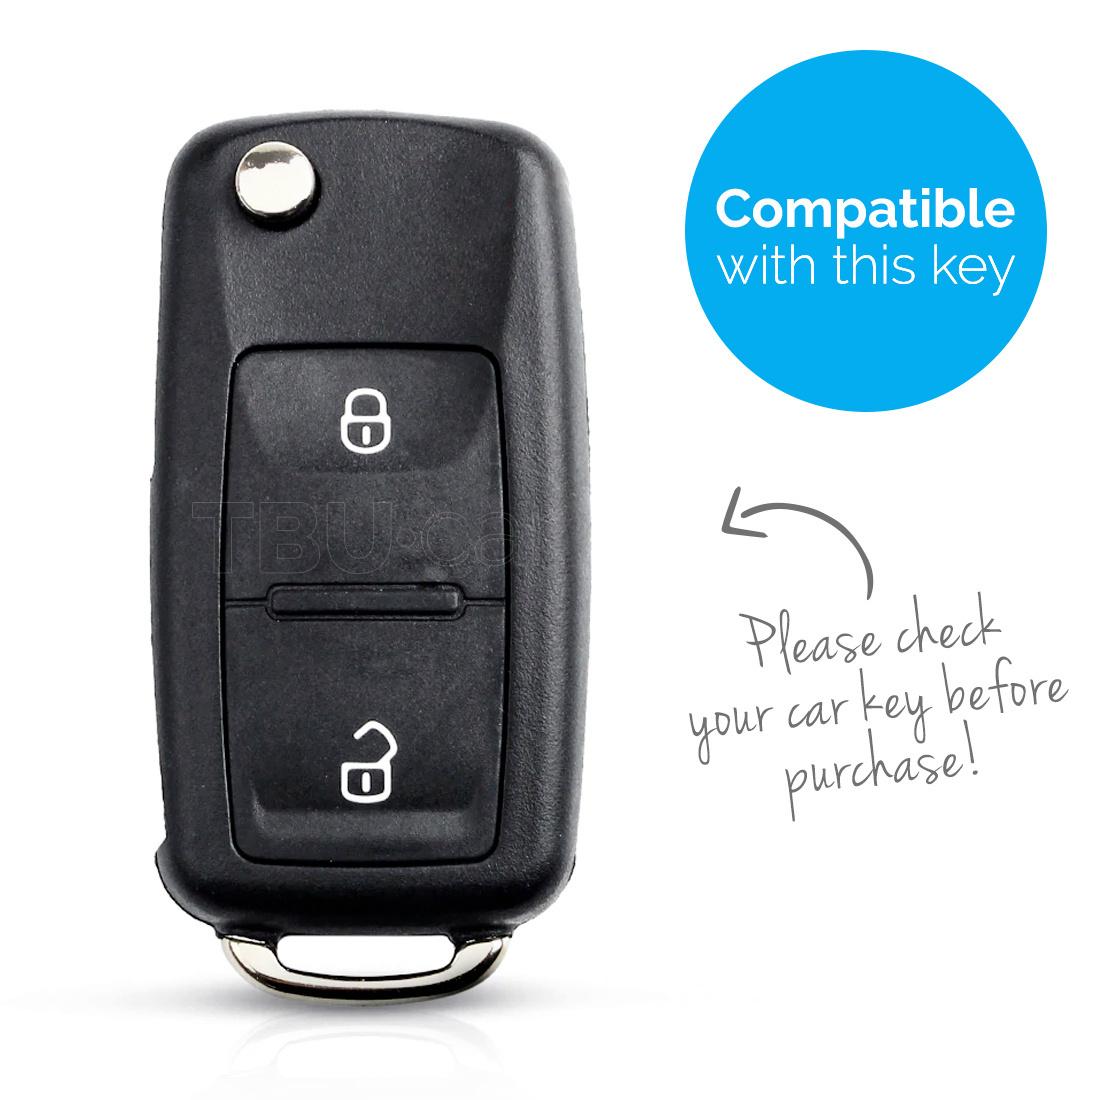 TBU car TBU car Sleutel cover compatibel met Seat - Silicone sleutelhoesje - beschermhoesje autosleutel - Zwart